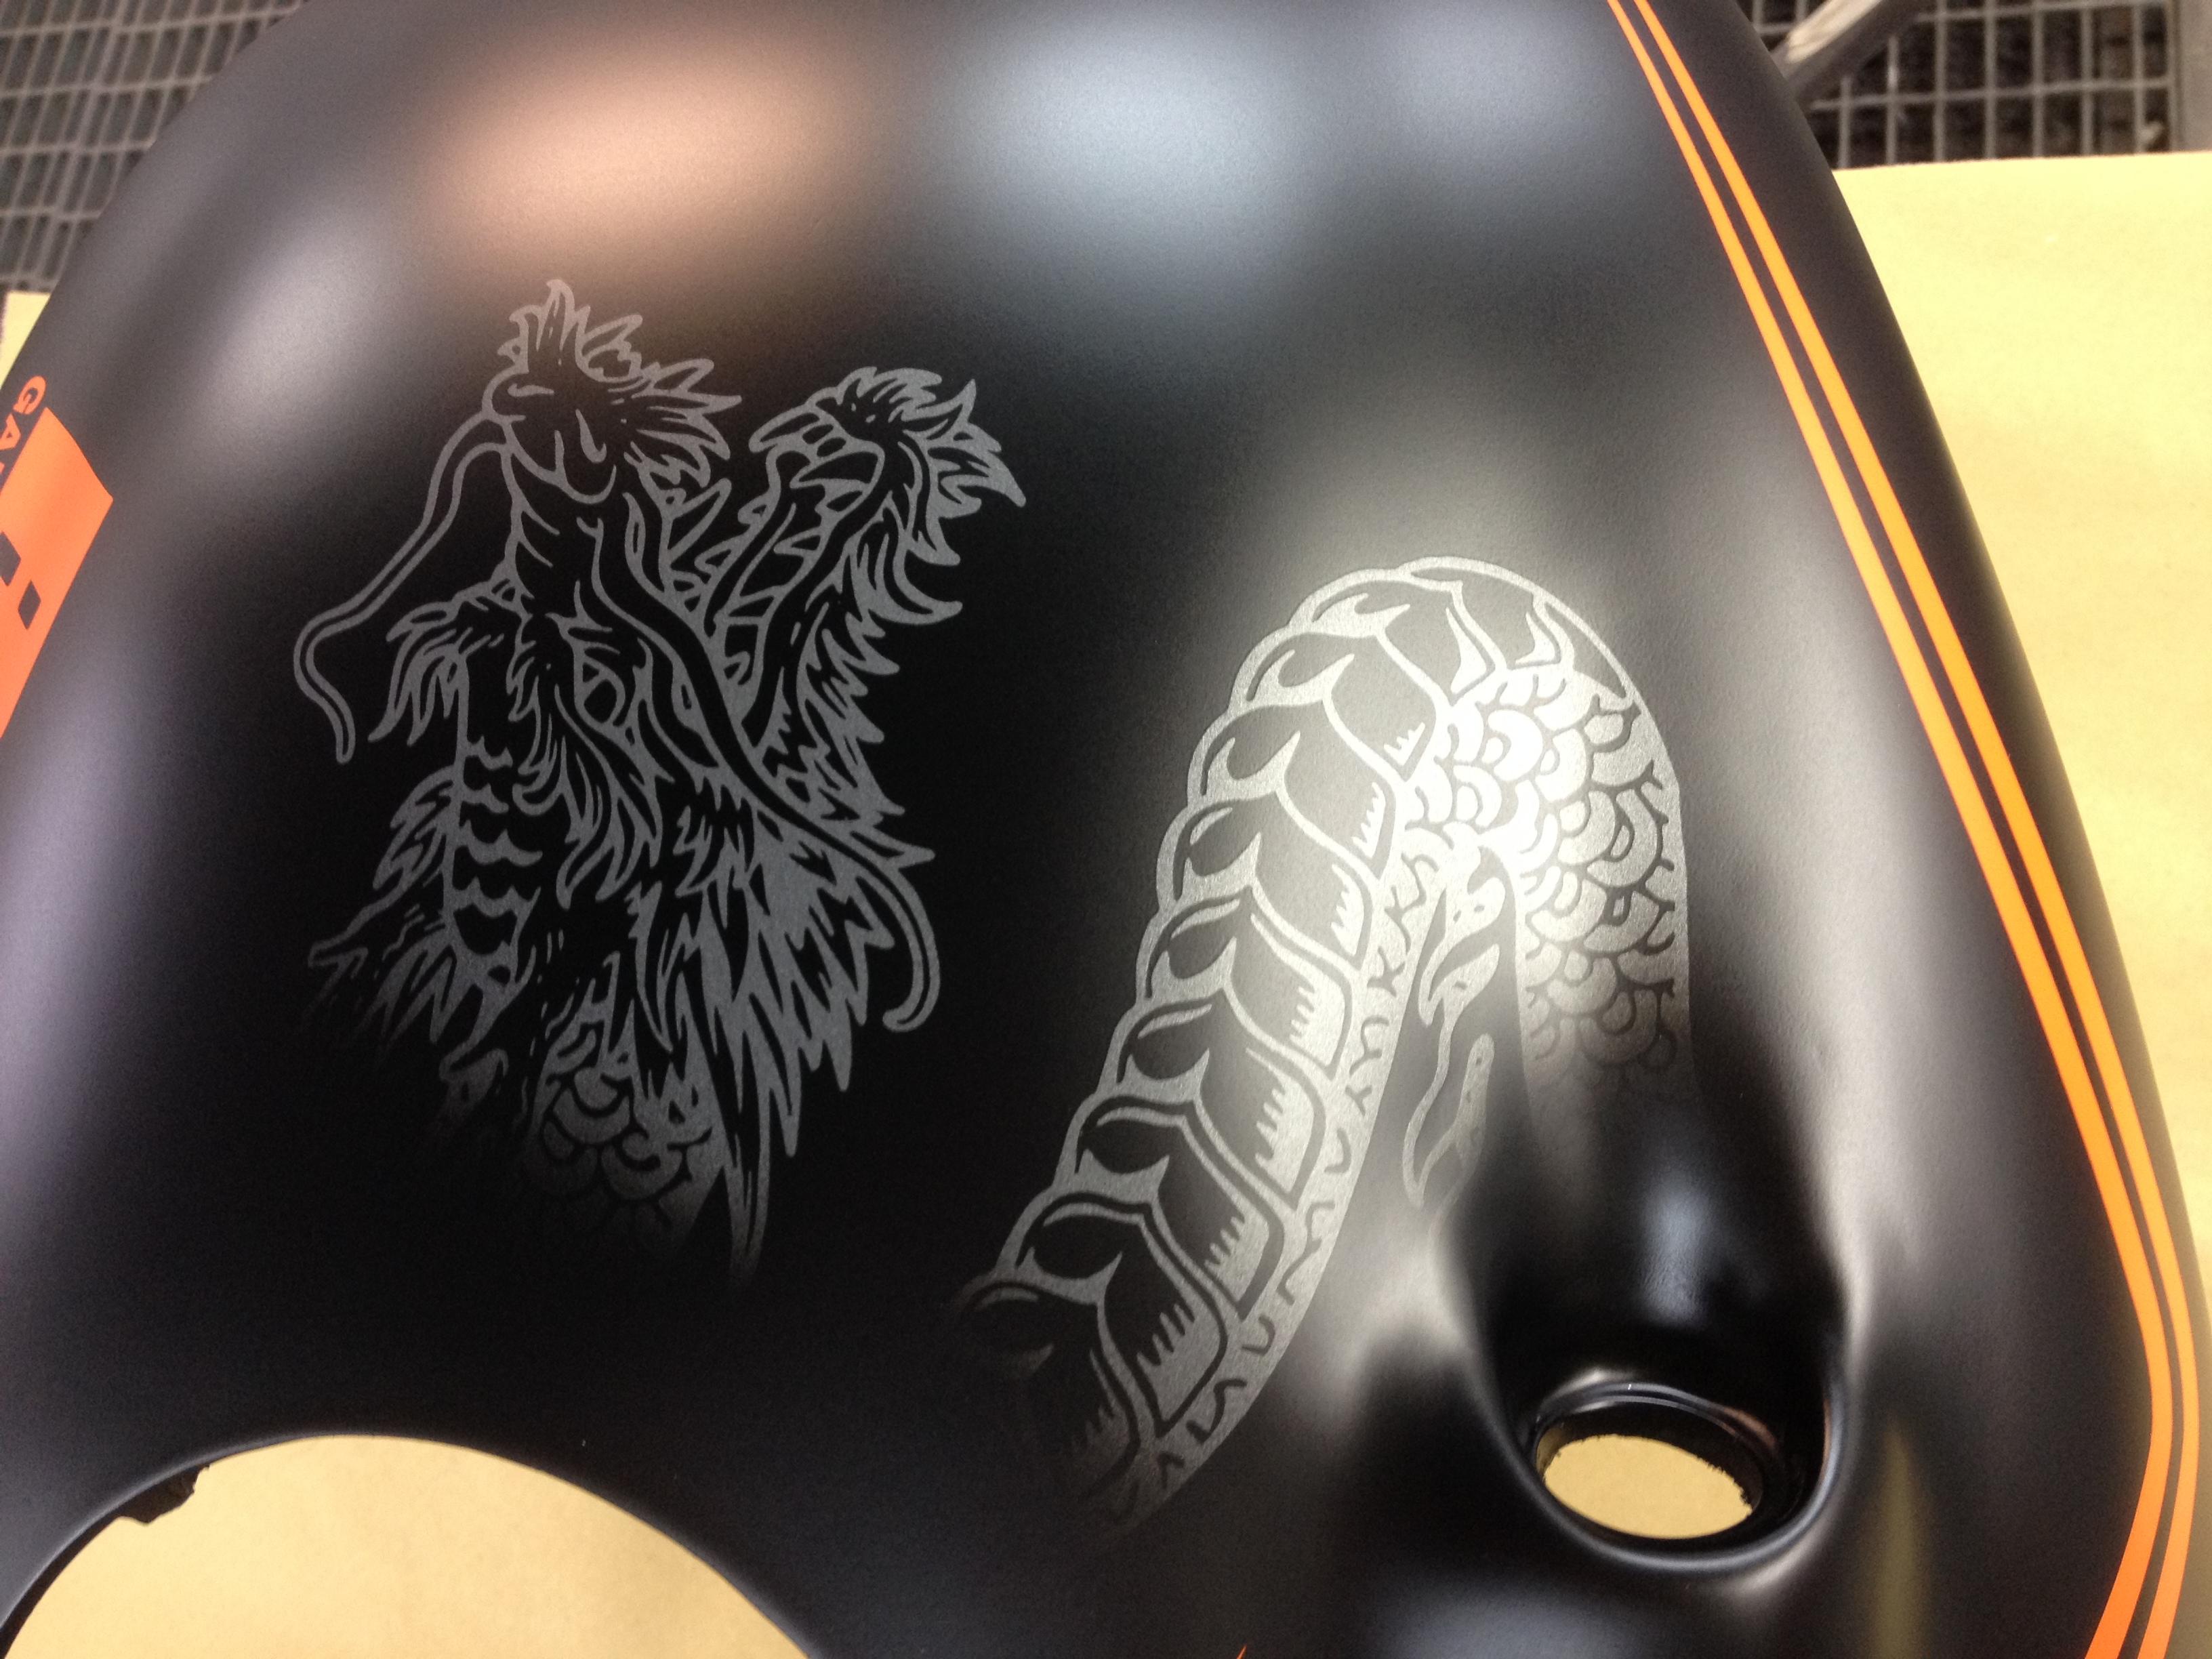 Buell Black Dragon by Garajek